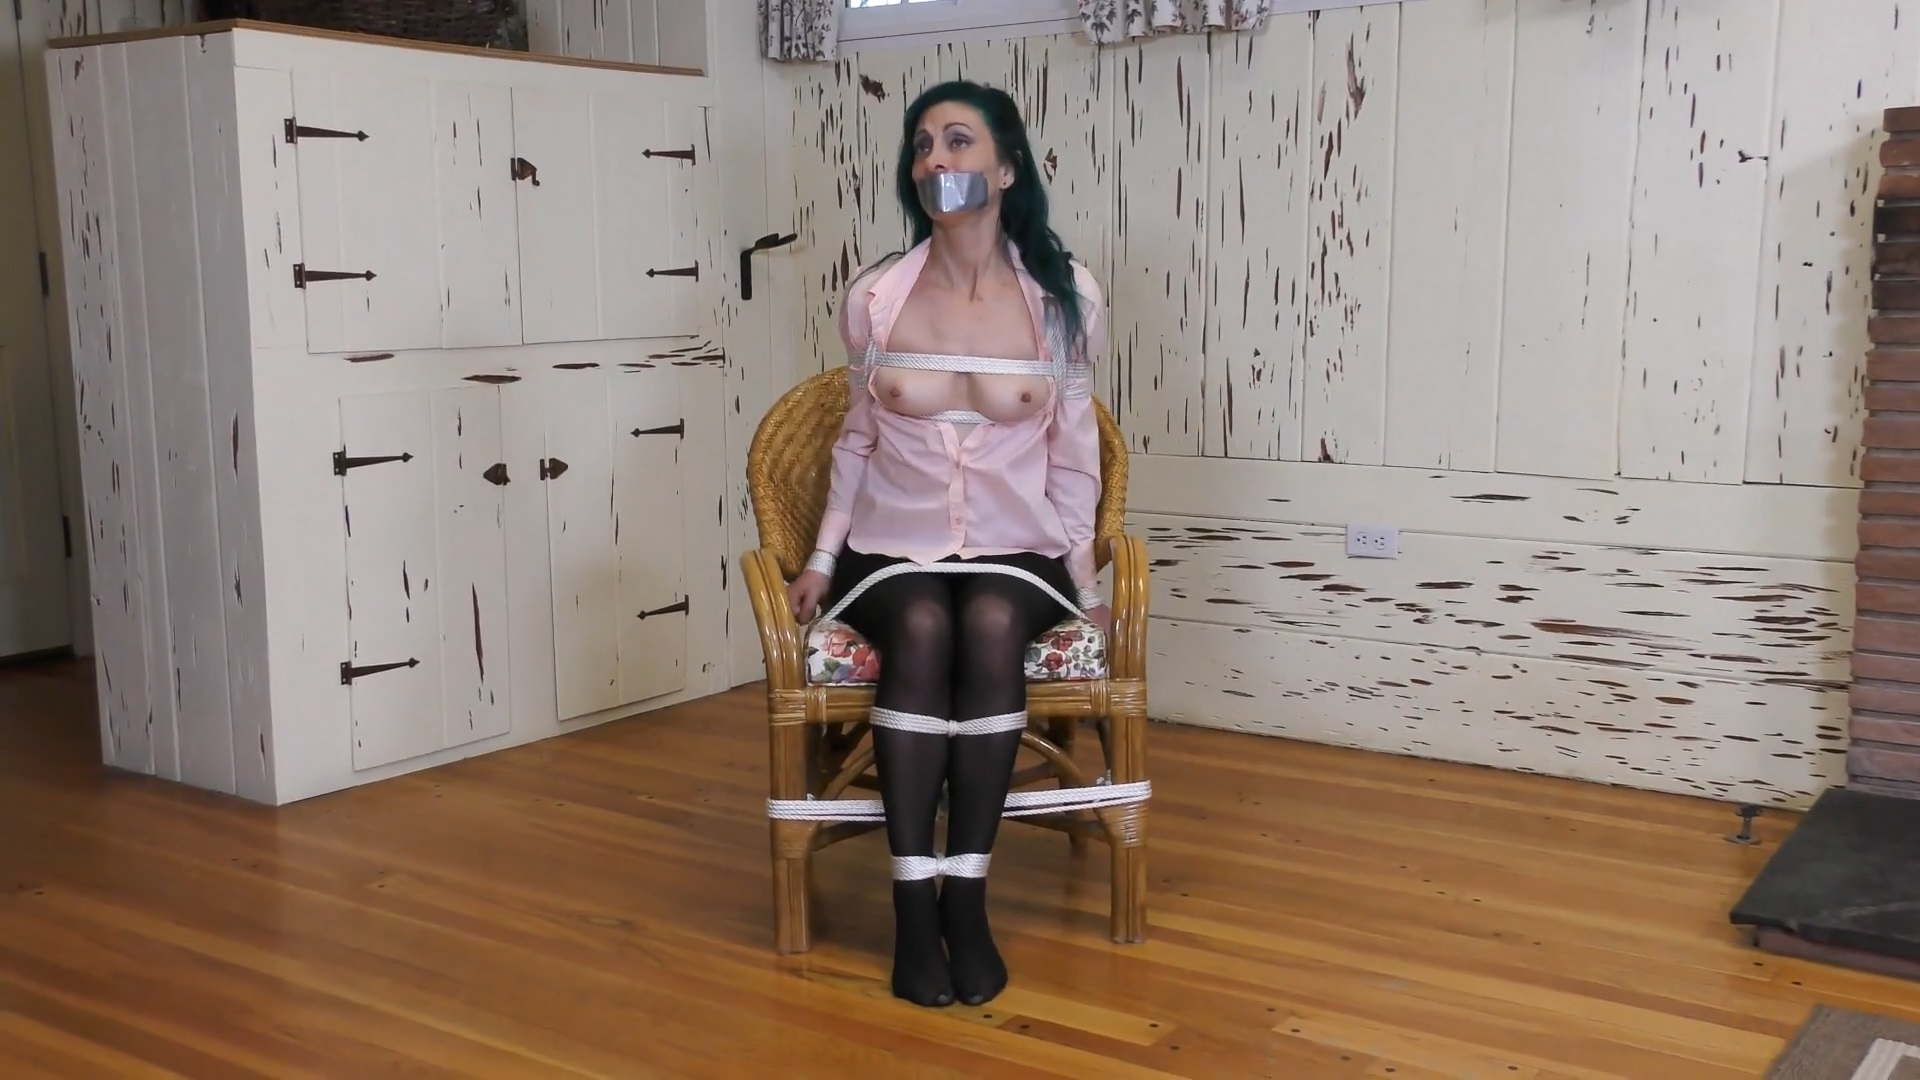 Loren Chance Held Captive_Bad Guys Silent